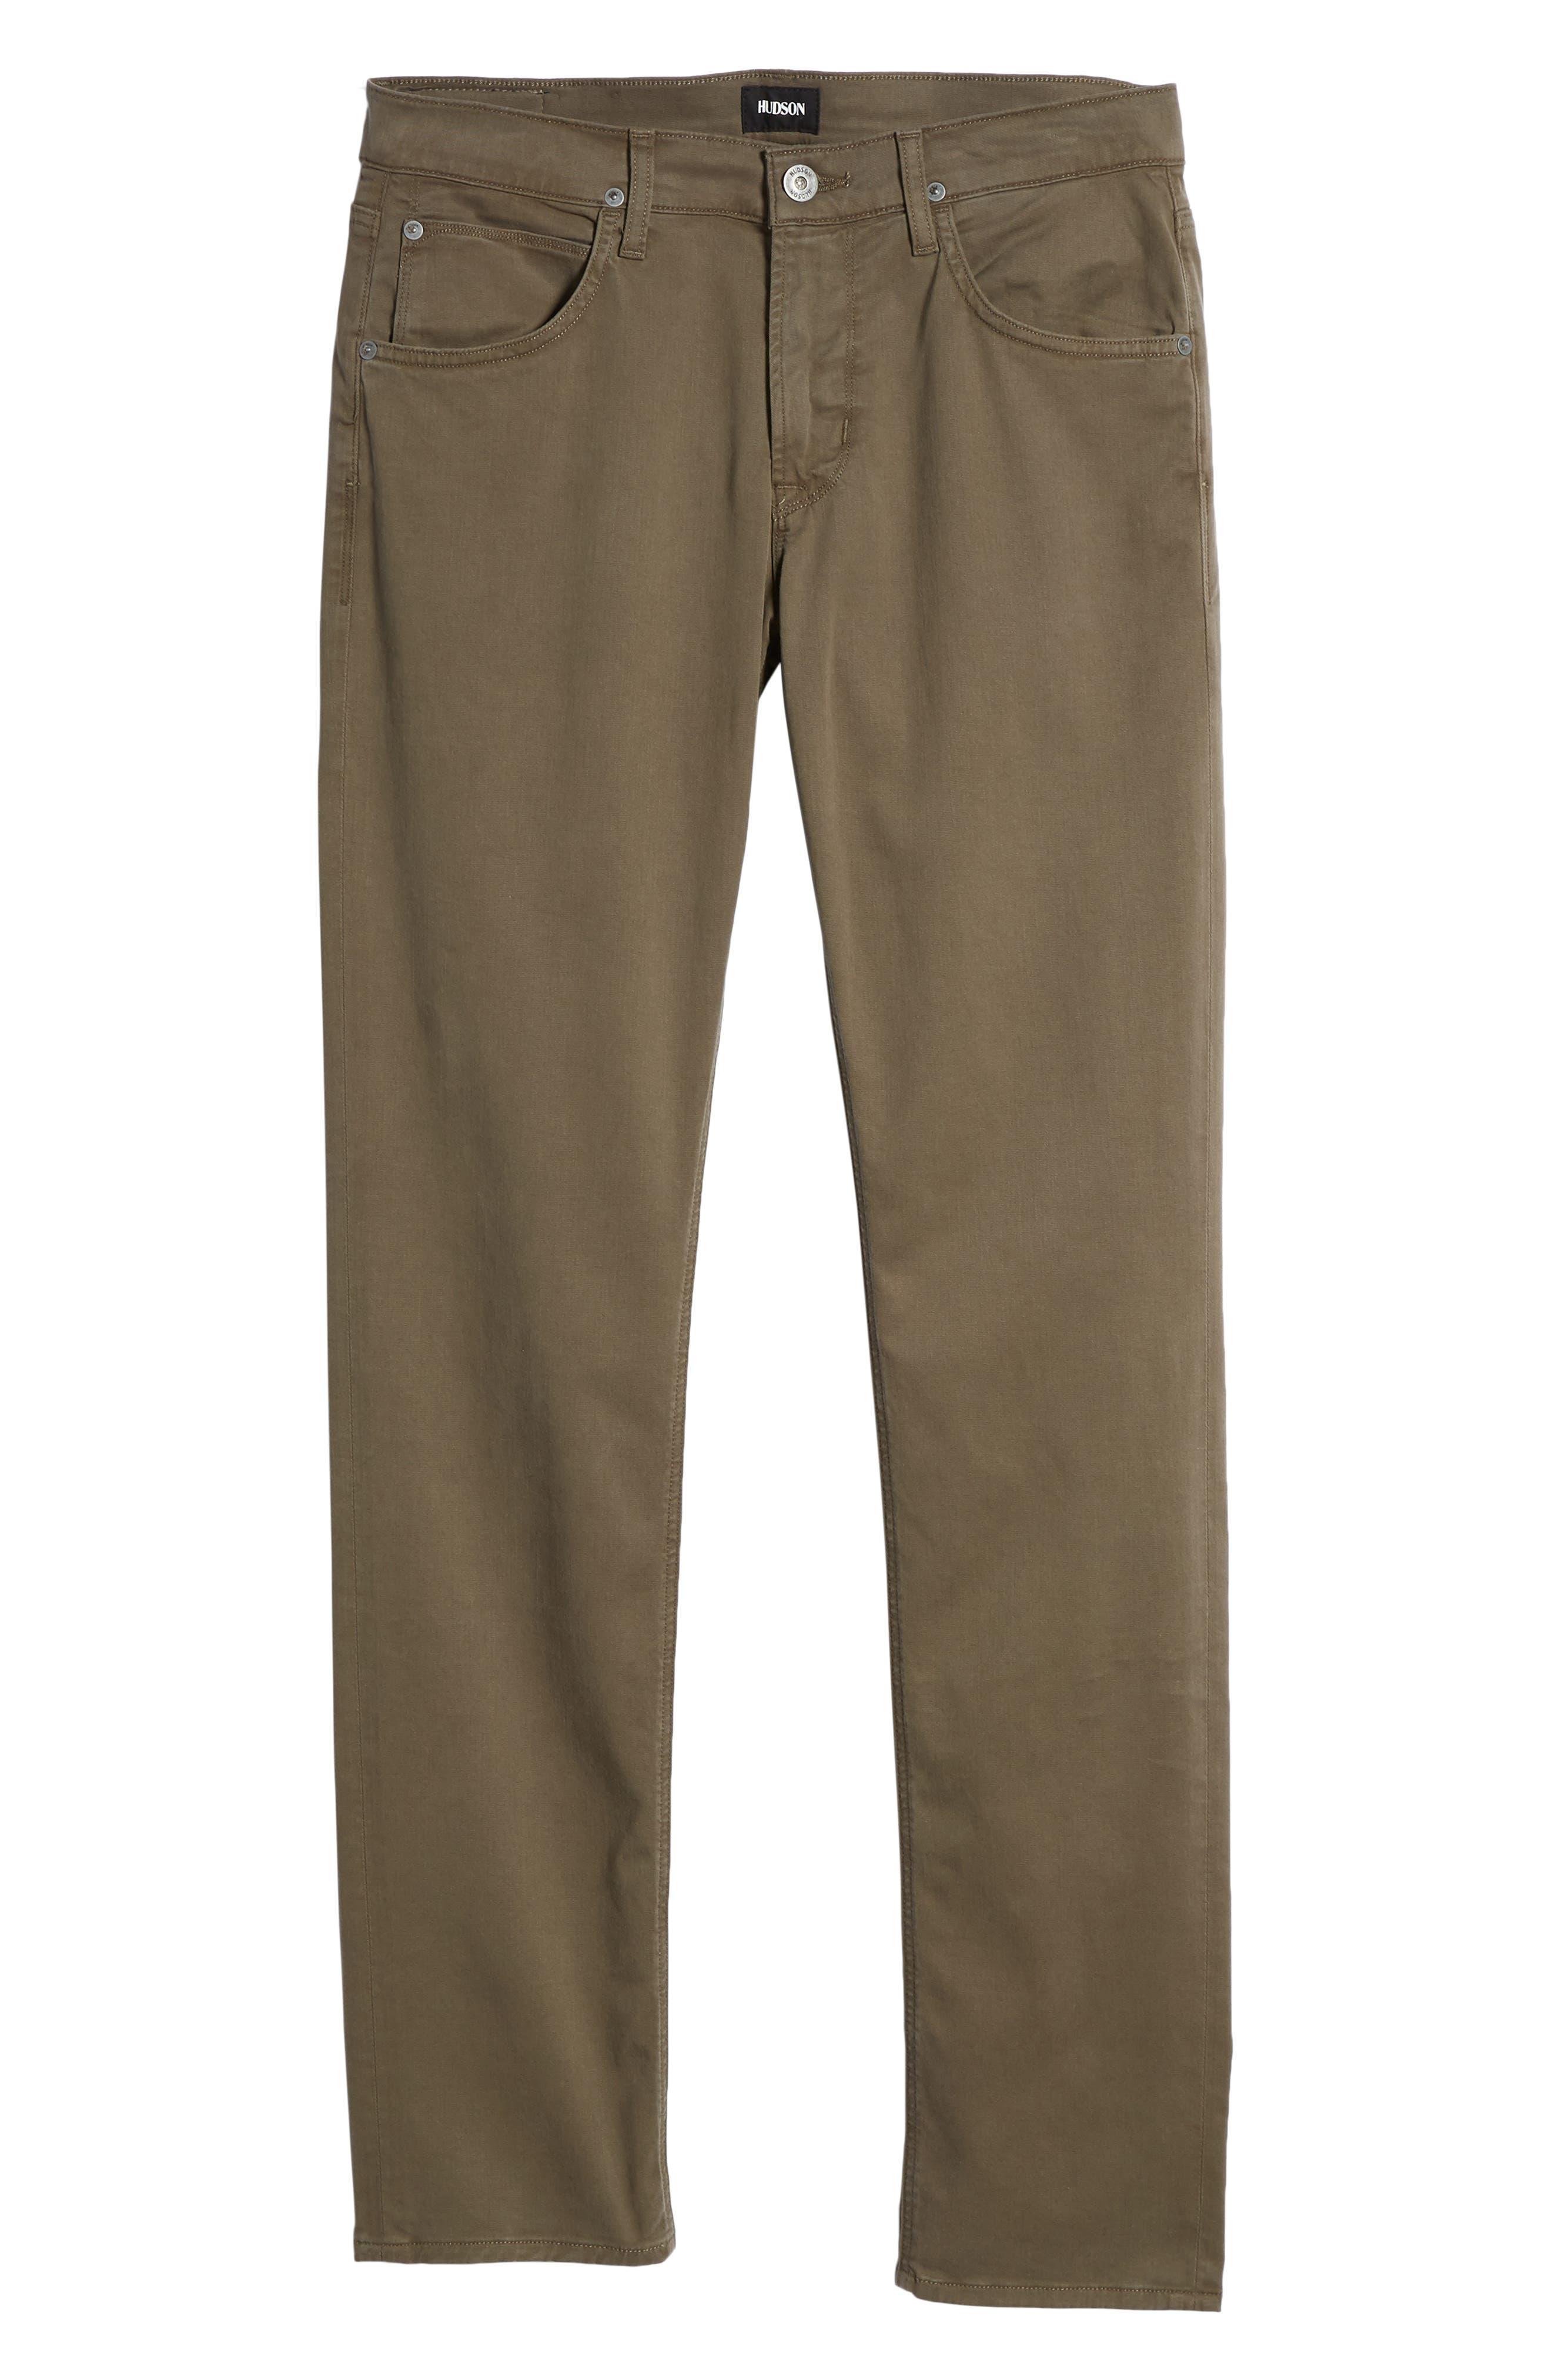 Blake Slim Fit Jeans,                             Alternate thumbnail 6, color,                             PLASTER